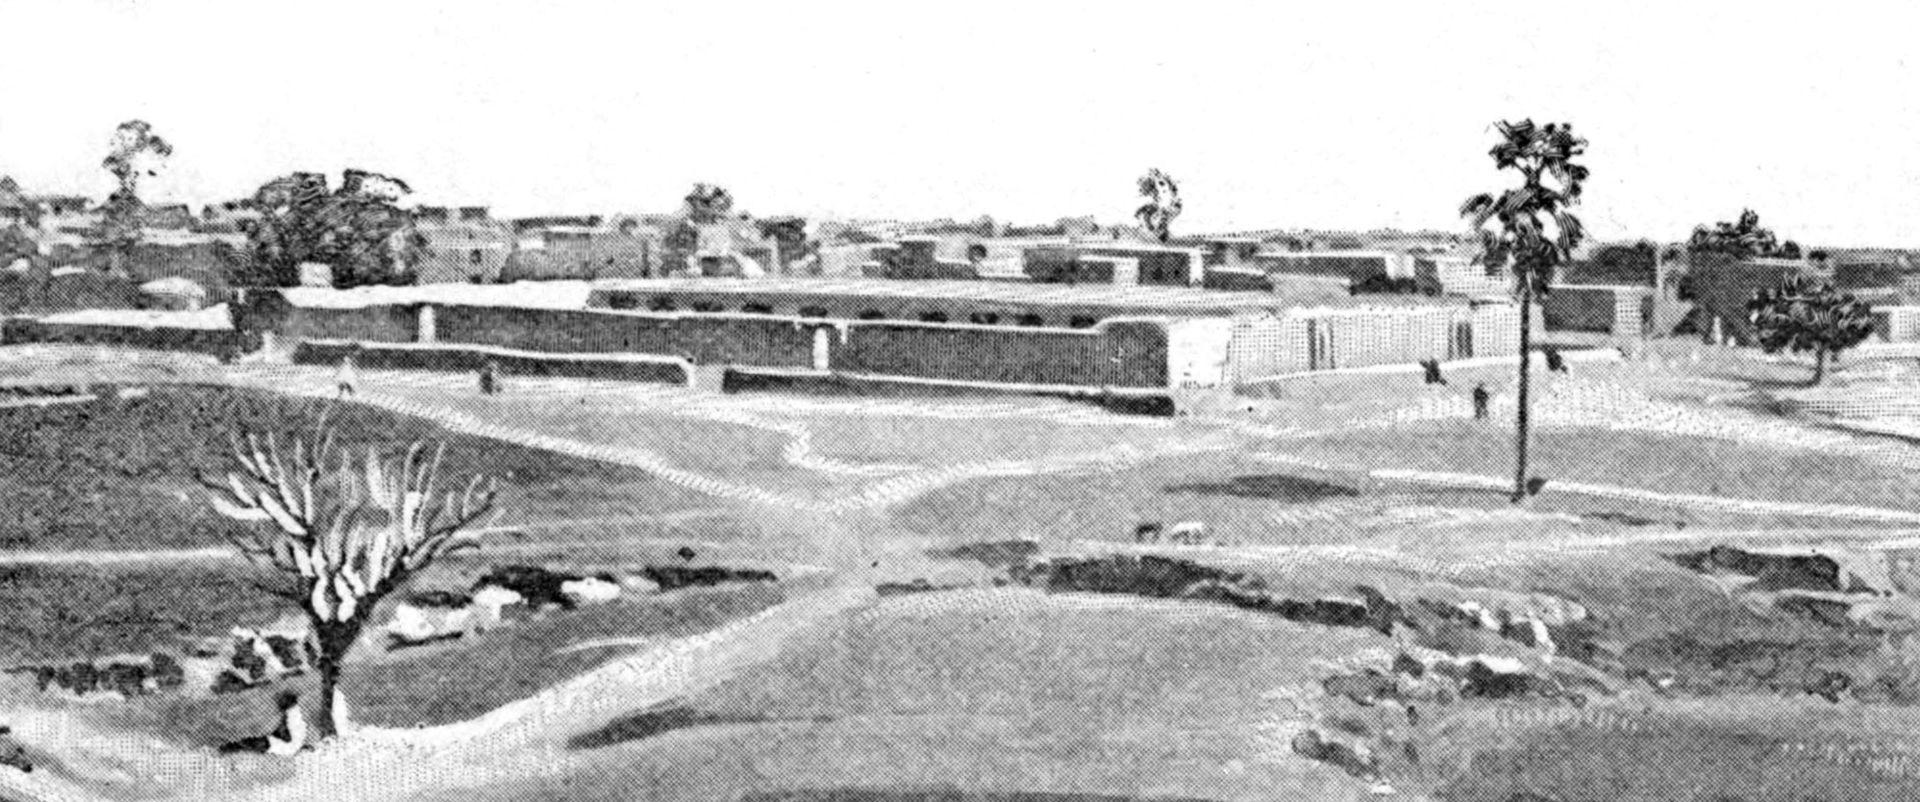 190910_2l.jpg